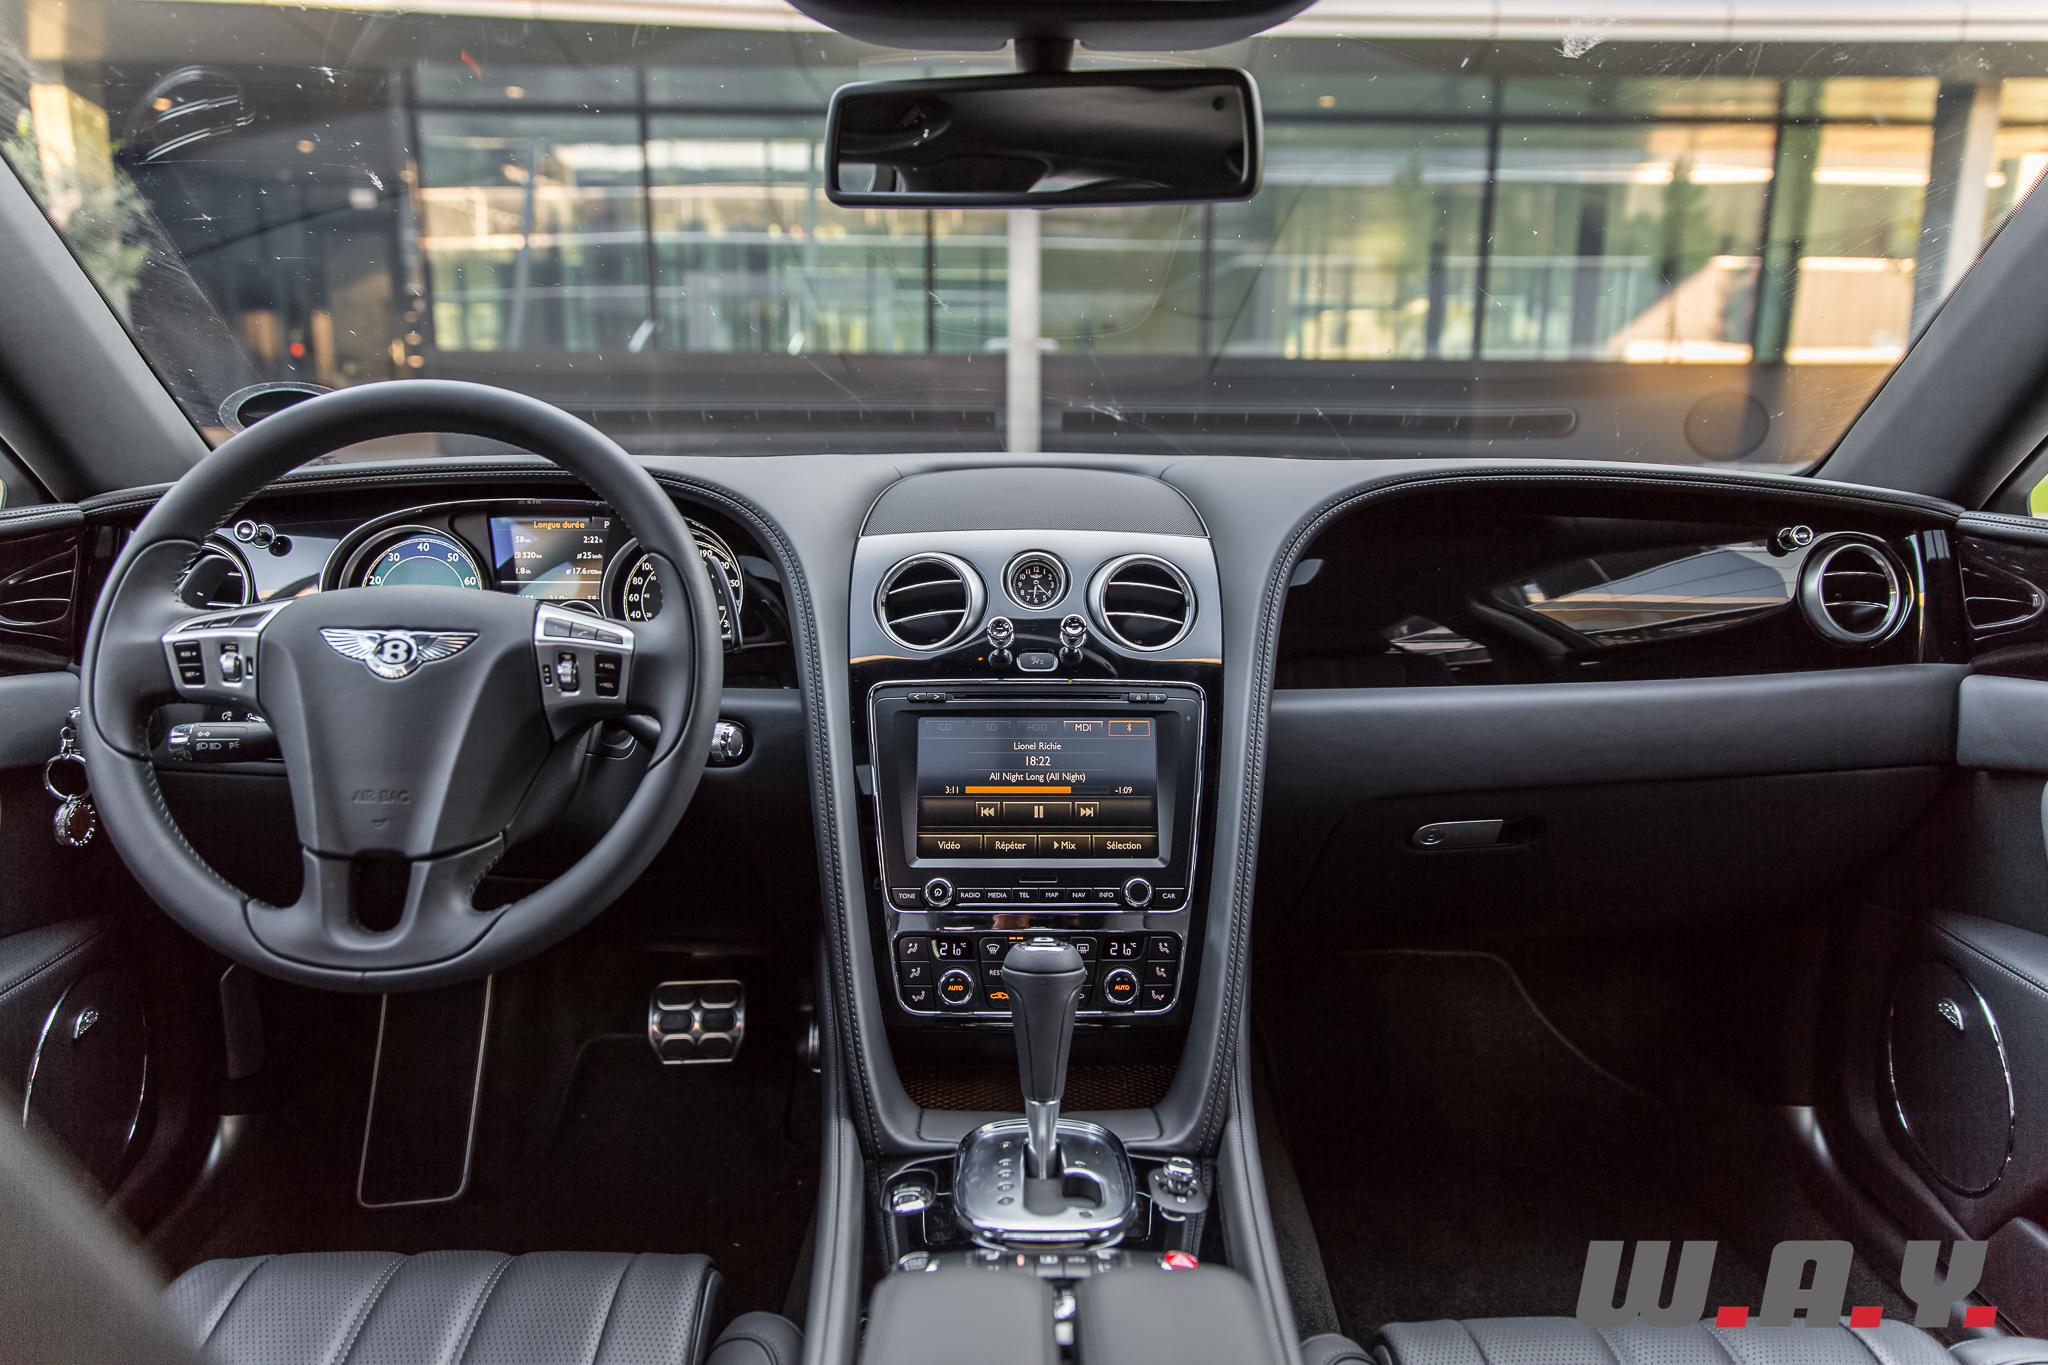 BentleyFlyingSpurV8-39